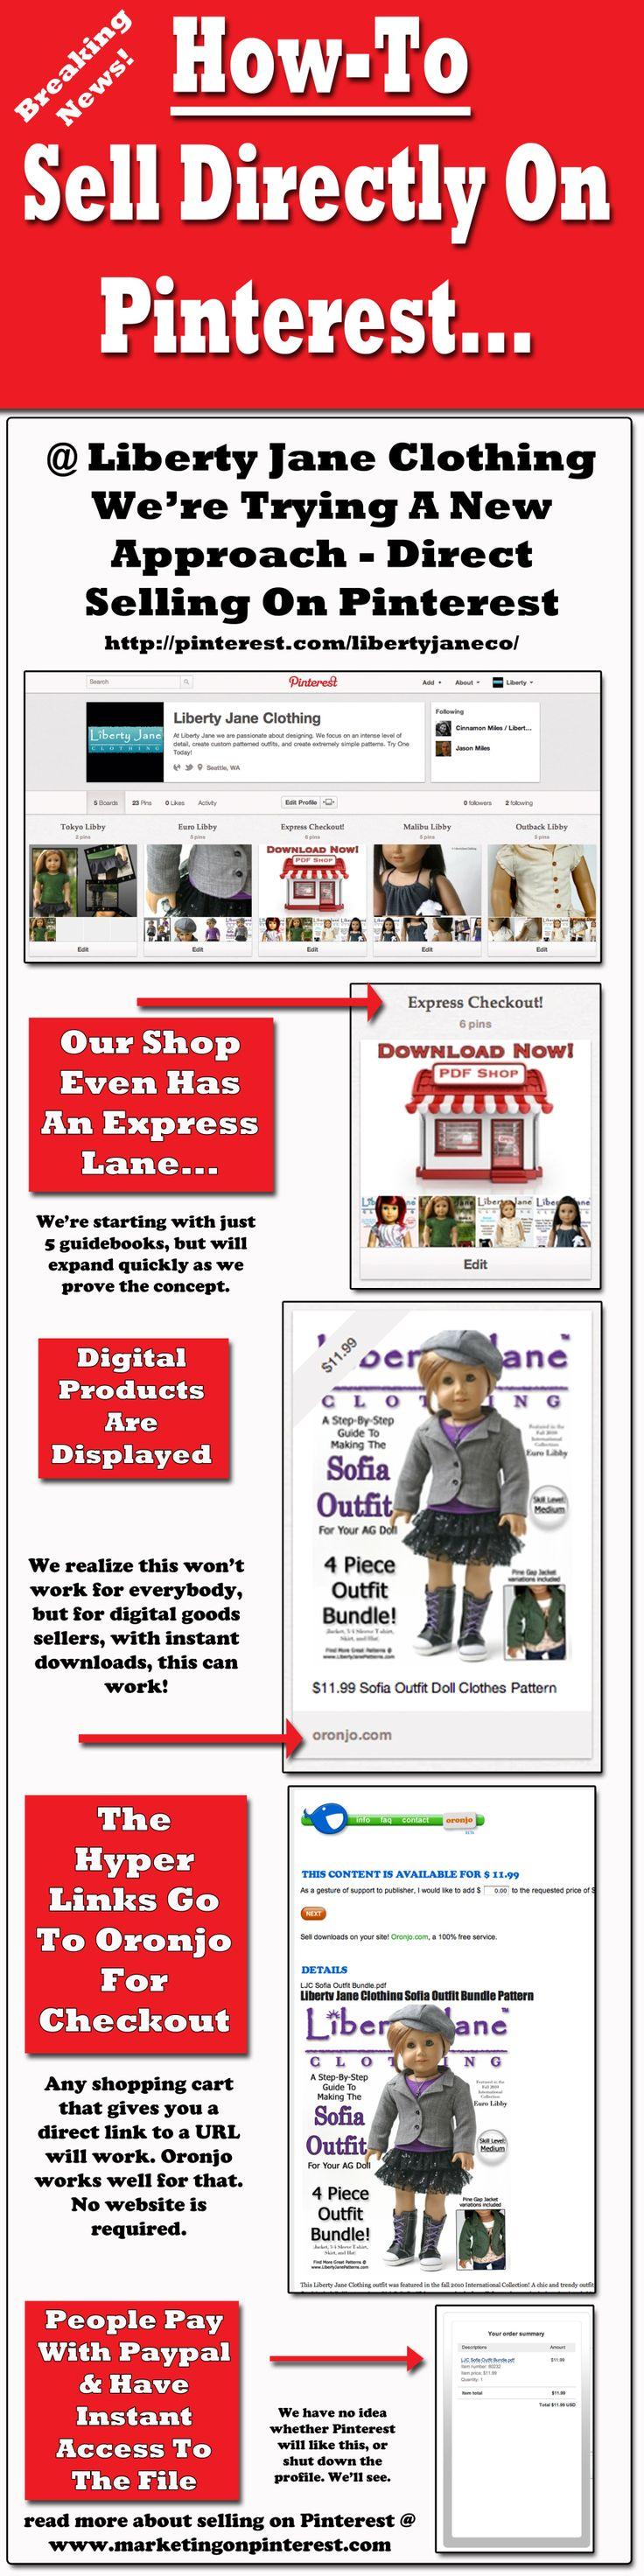 Selling Directly On Pinterest | Marketing On Pinterest